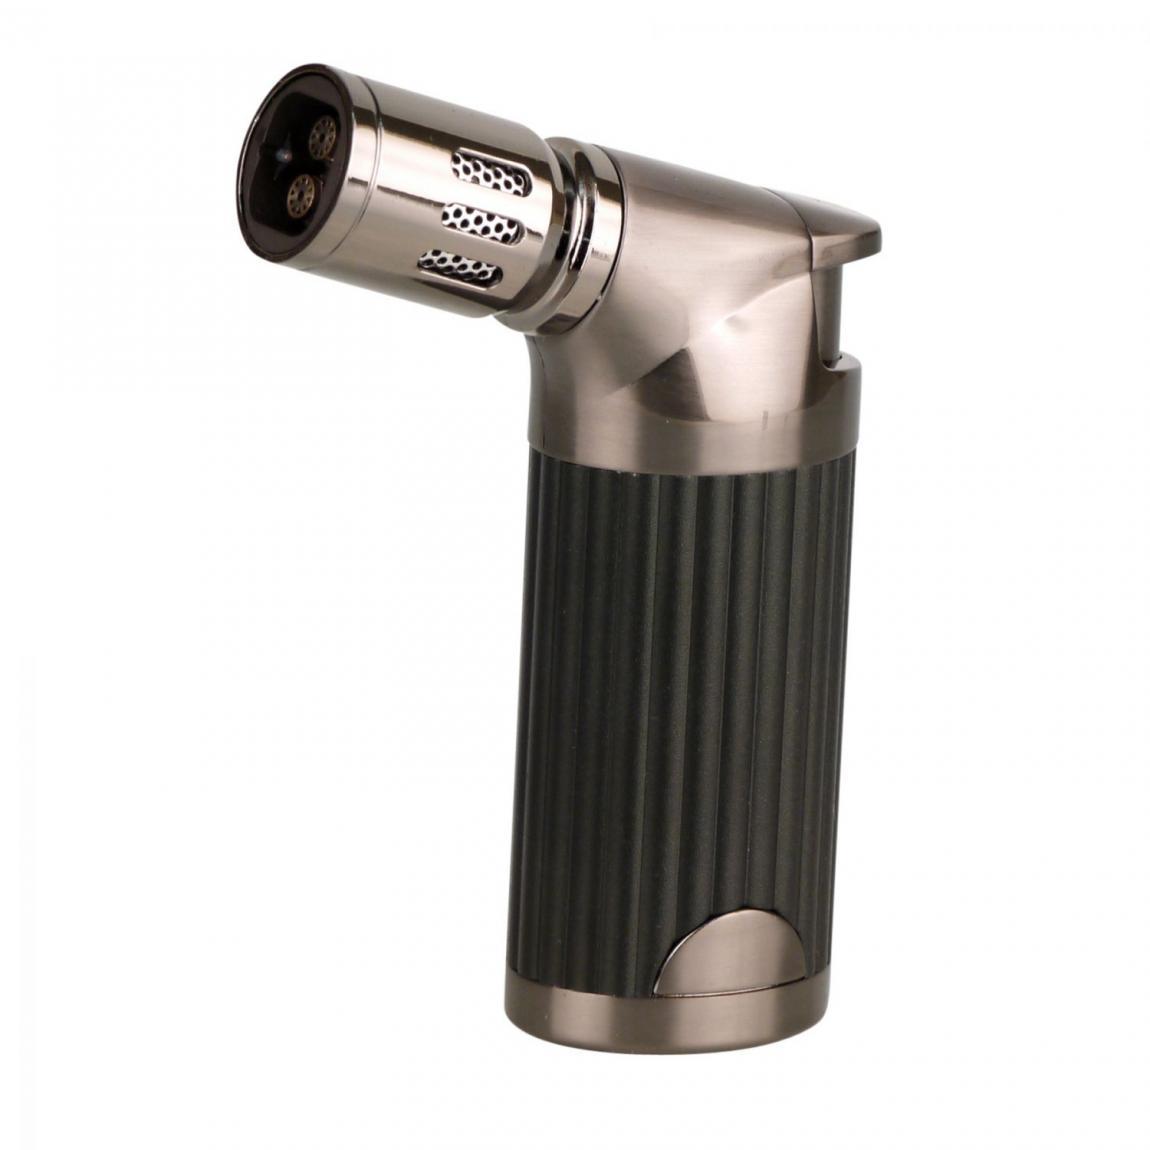 Sky Feuerzeug »Uranus« Quadruplex Torch Lighter